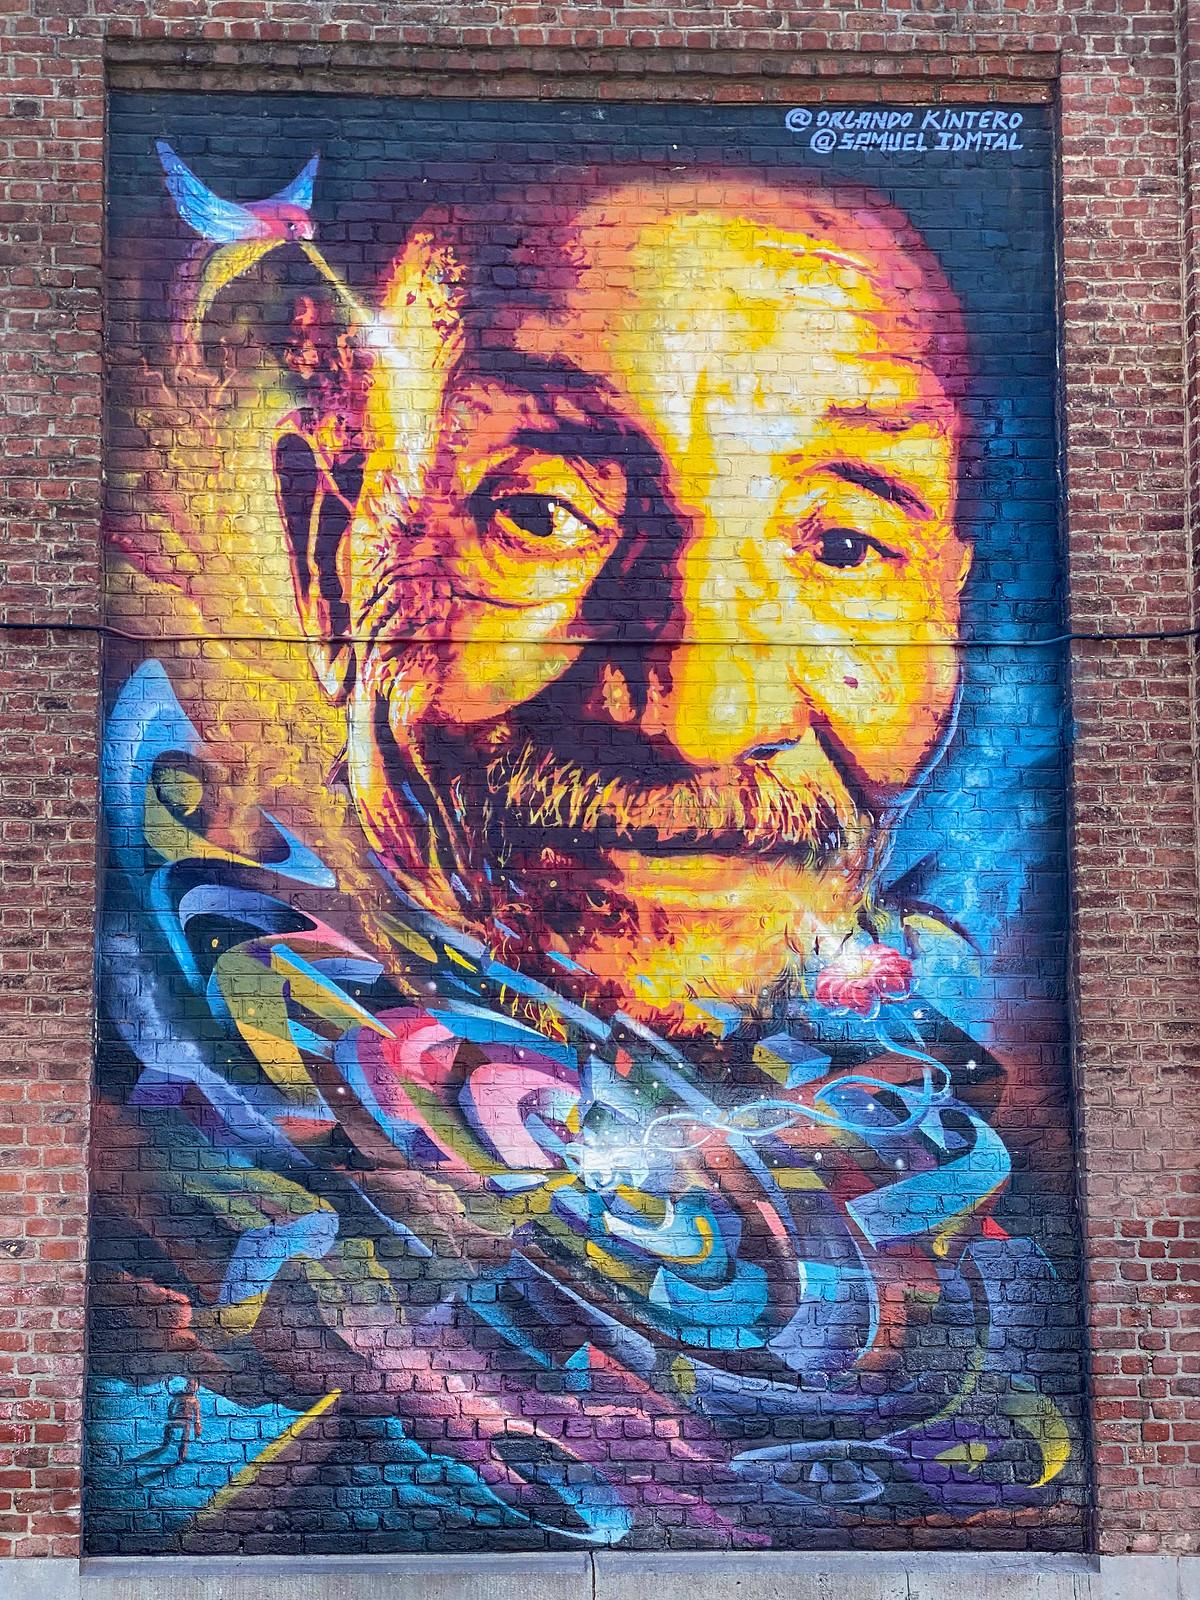 Street art Portrait of Pierre Rabhi by Samuel Idmtal & Orlando Kintero